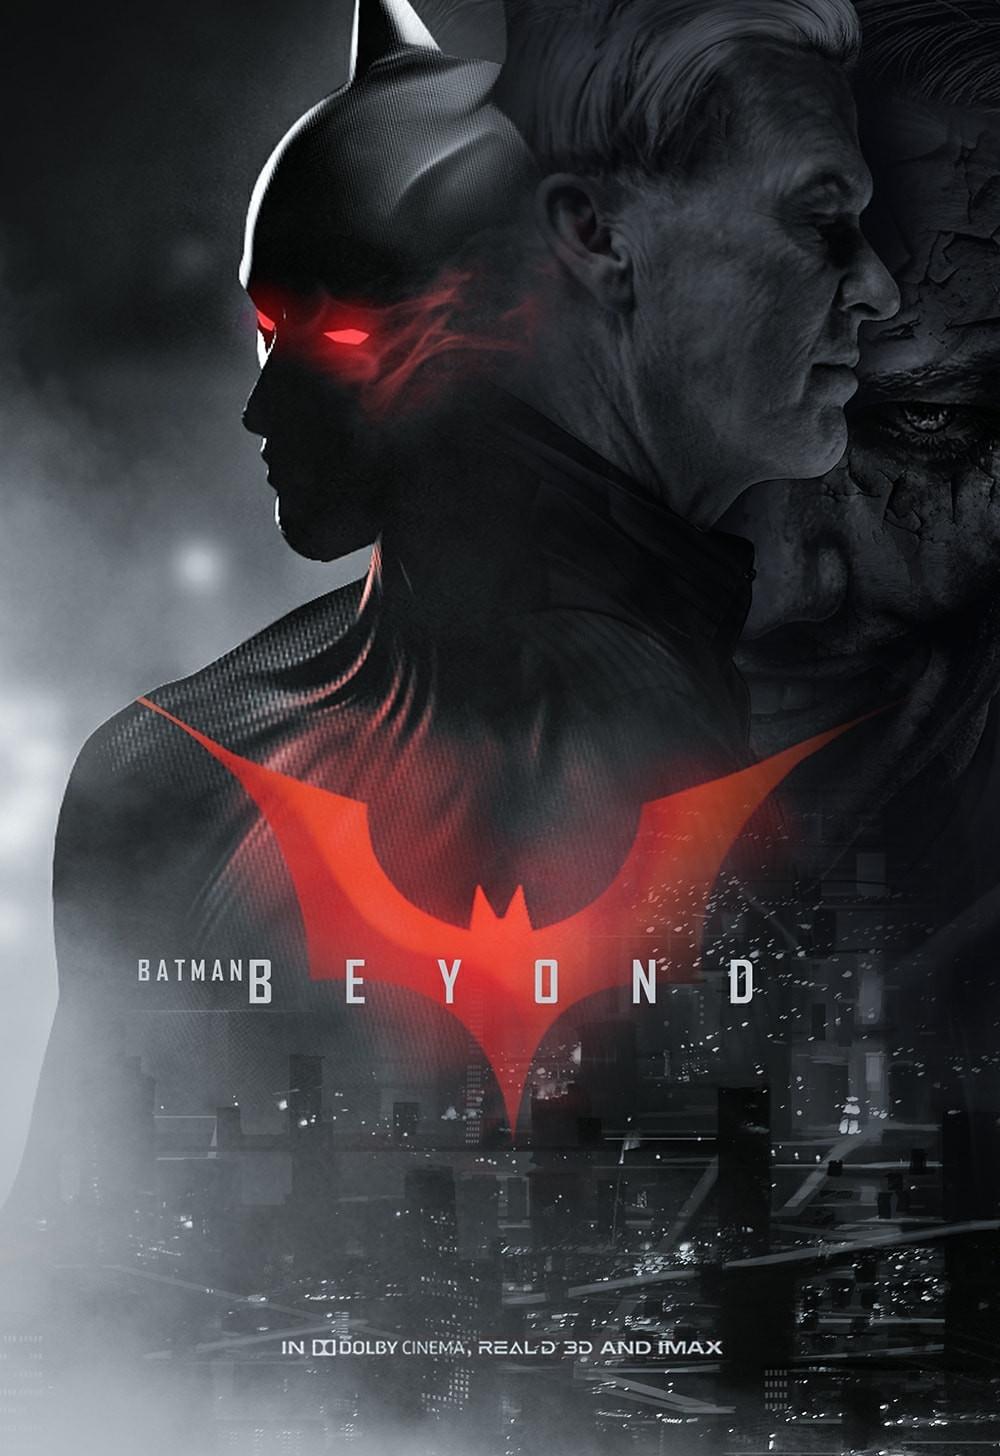 Batman Beyond Michael Keaton fan art